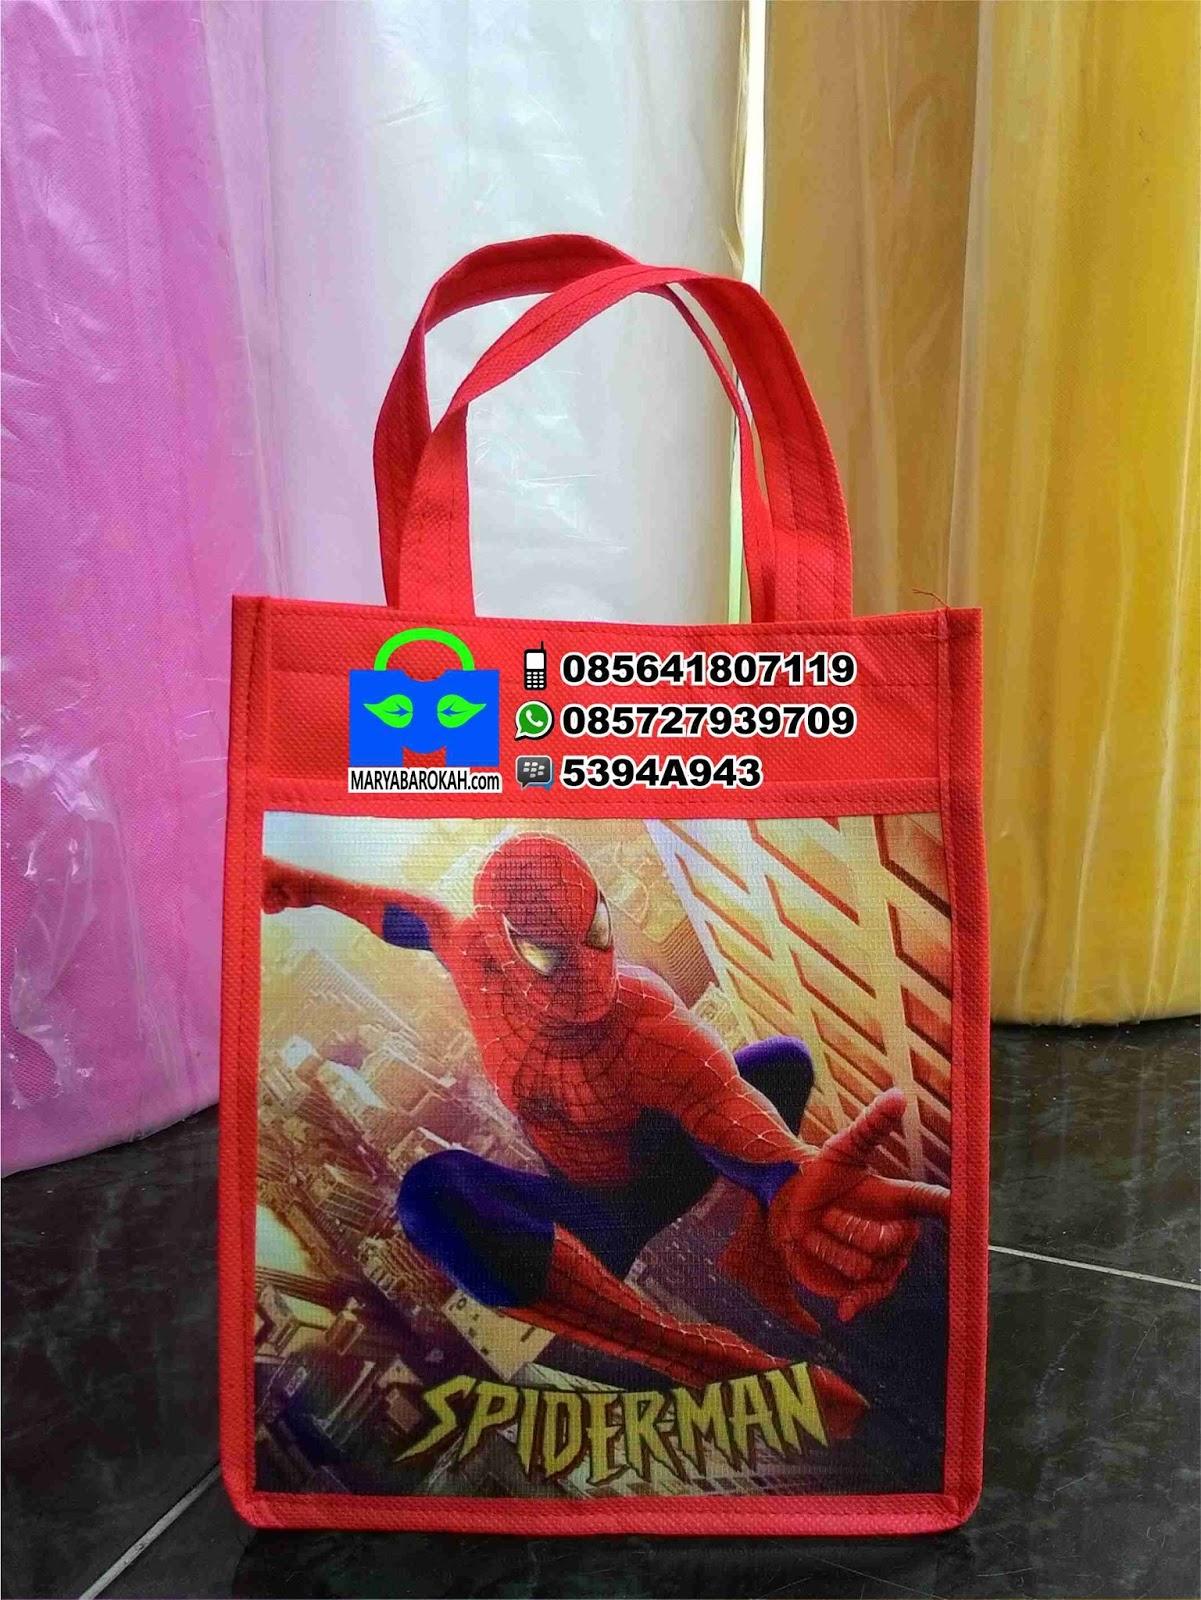 Tas Souvenir Ultah Anak Murah Spiderman Pakai Foto Desain Suka 1000 Minim Pesan 50pcs 25pcs Tanpa Sablon